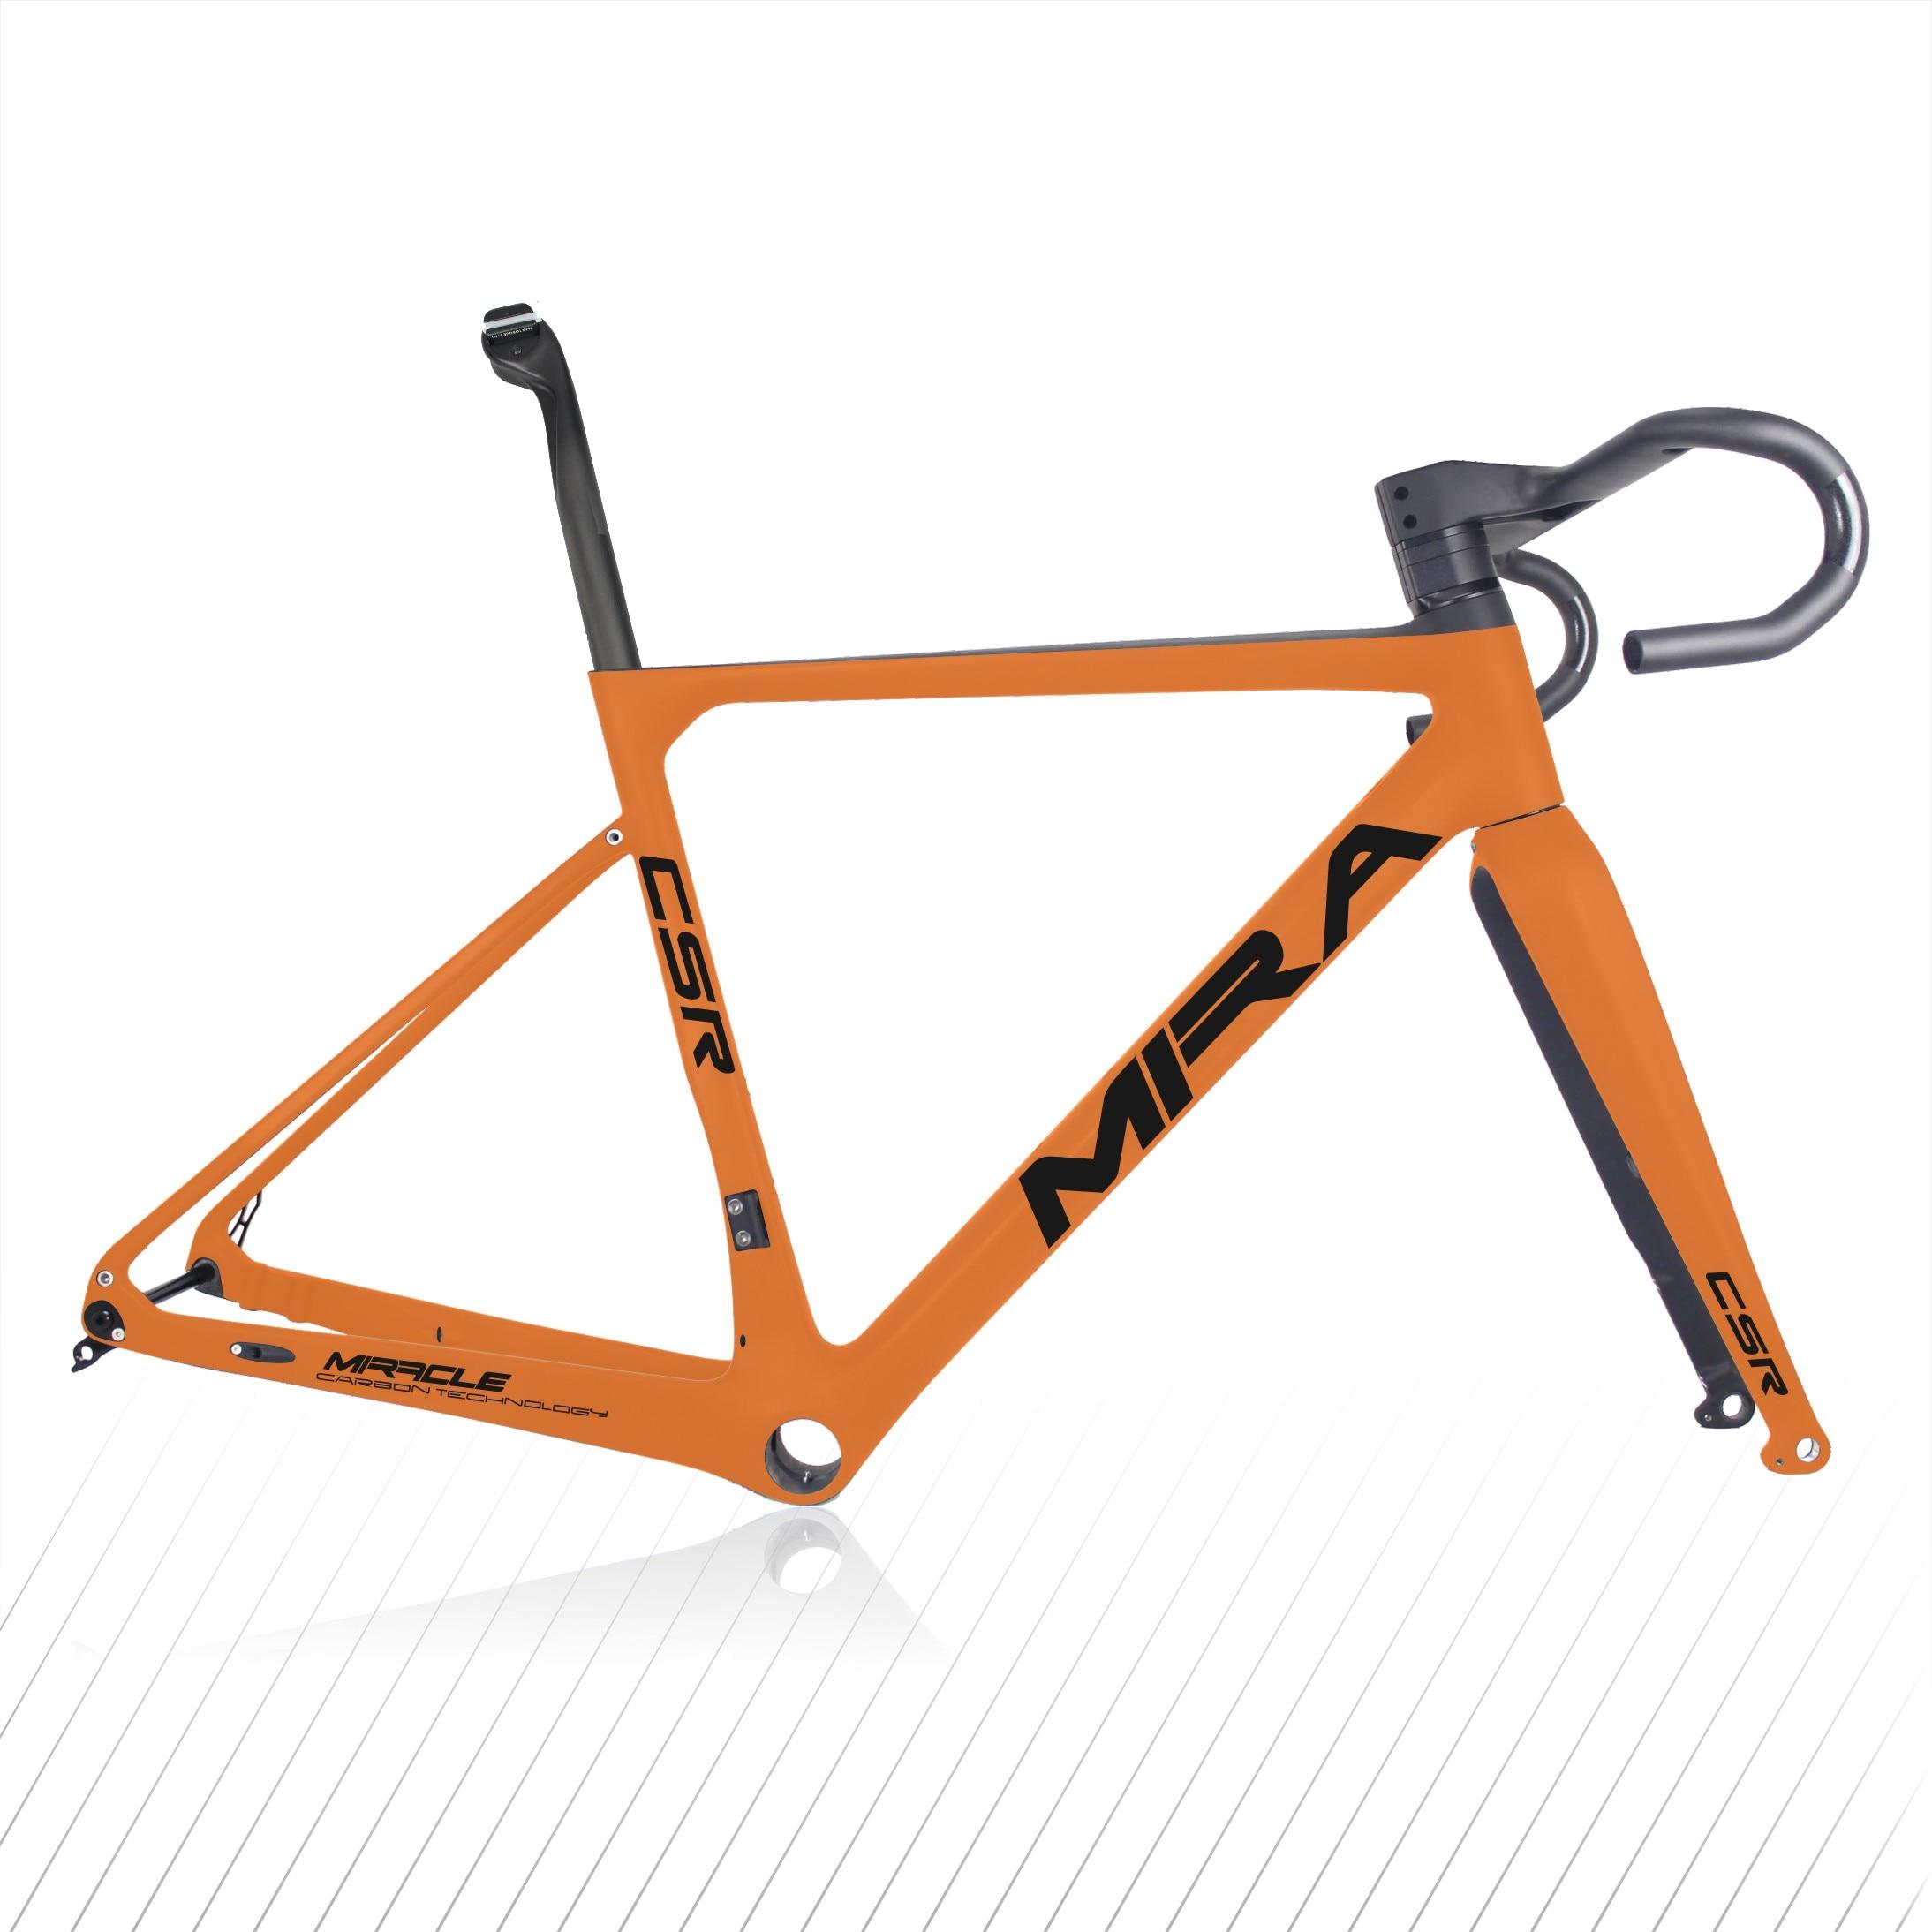 Top Sale Carbon Gravel Frame Aero Carbon Cyclocross Frameset Full Internal Cable 142*12mm Rear Thru Axle Gravel Bike